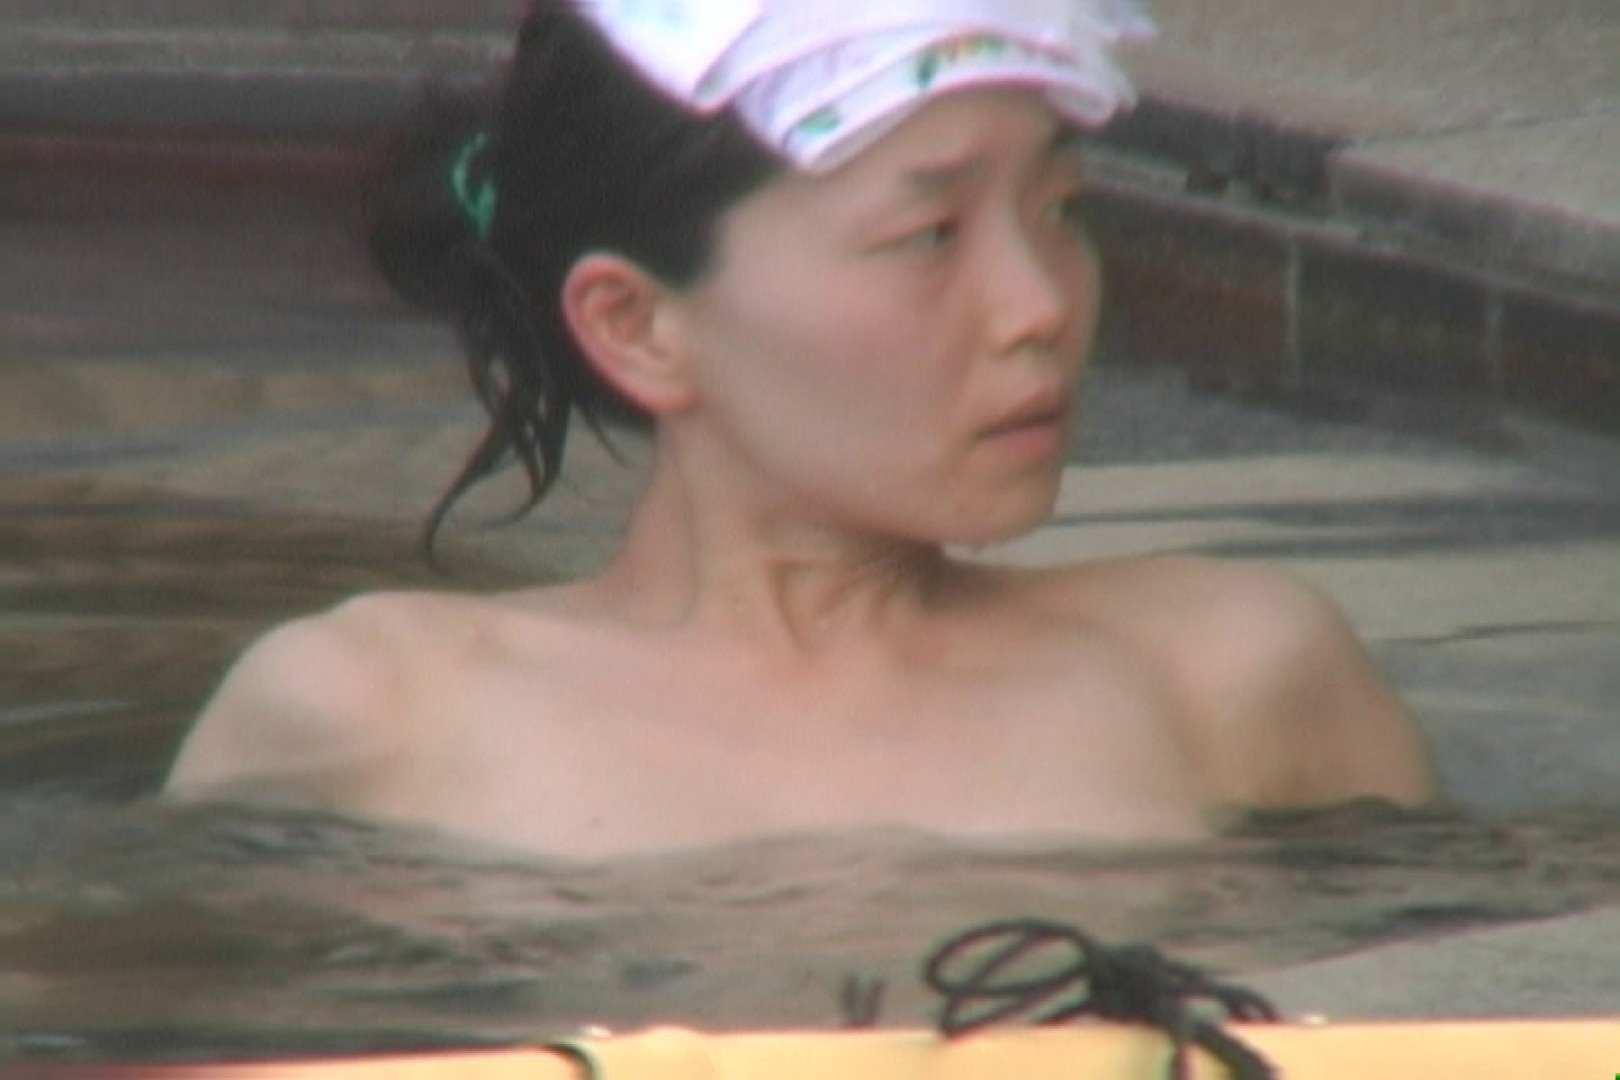 Aquaな露天風呂Vol.577 露天風呂突入   盗撮師作品  101pic 28